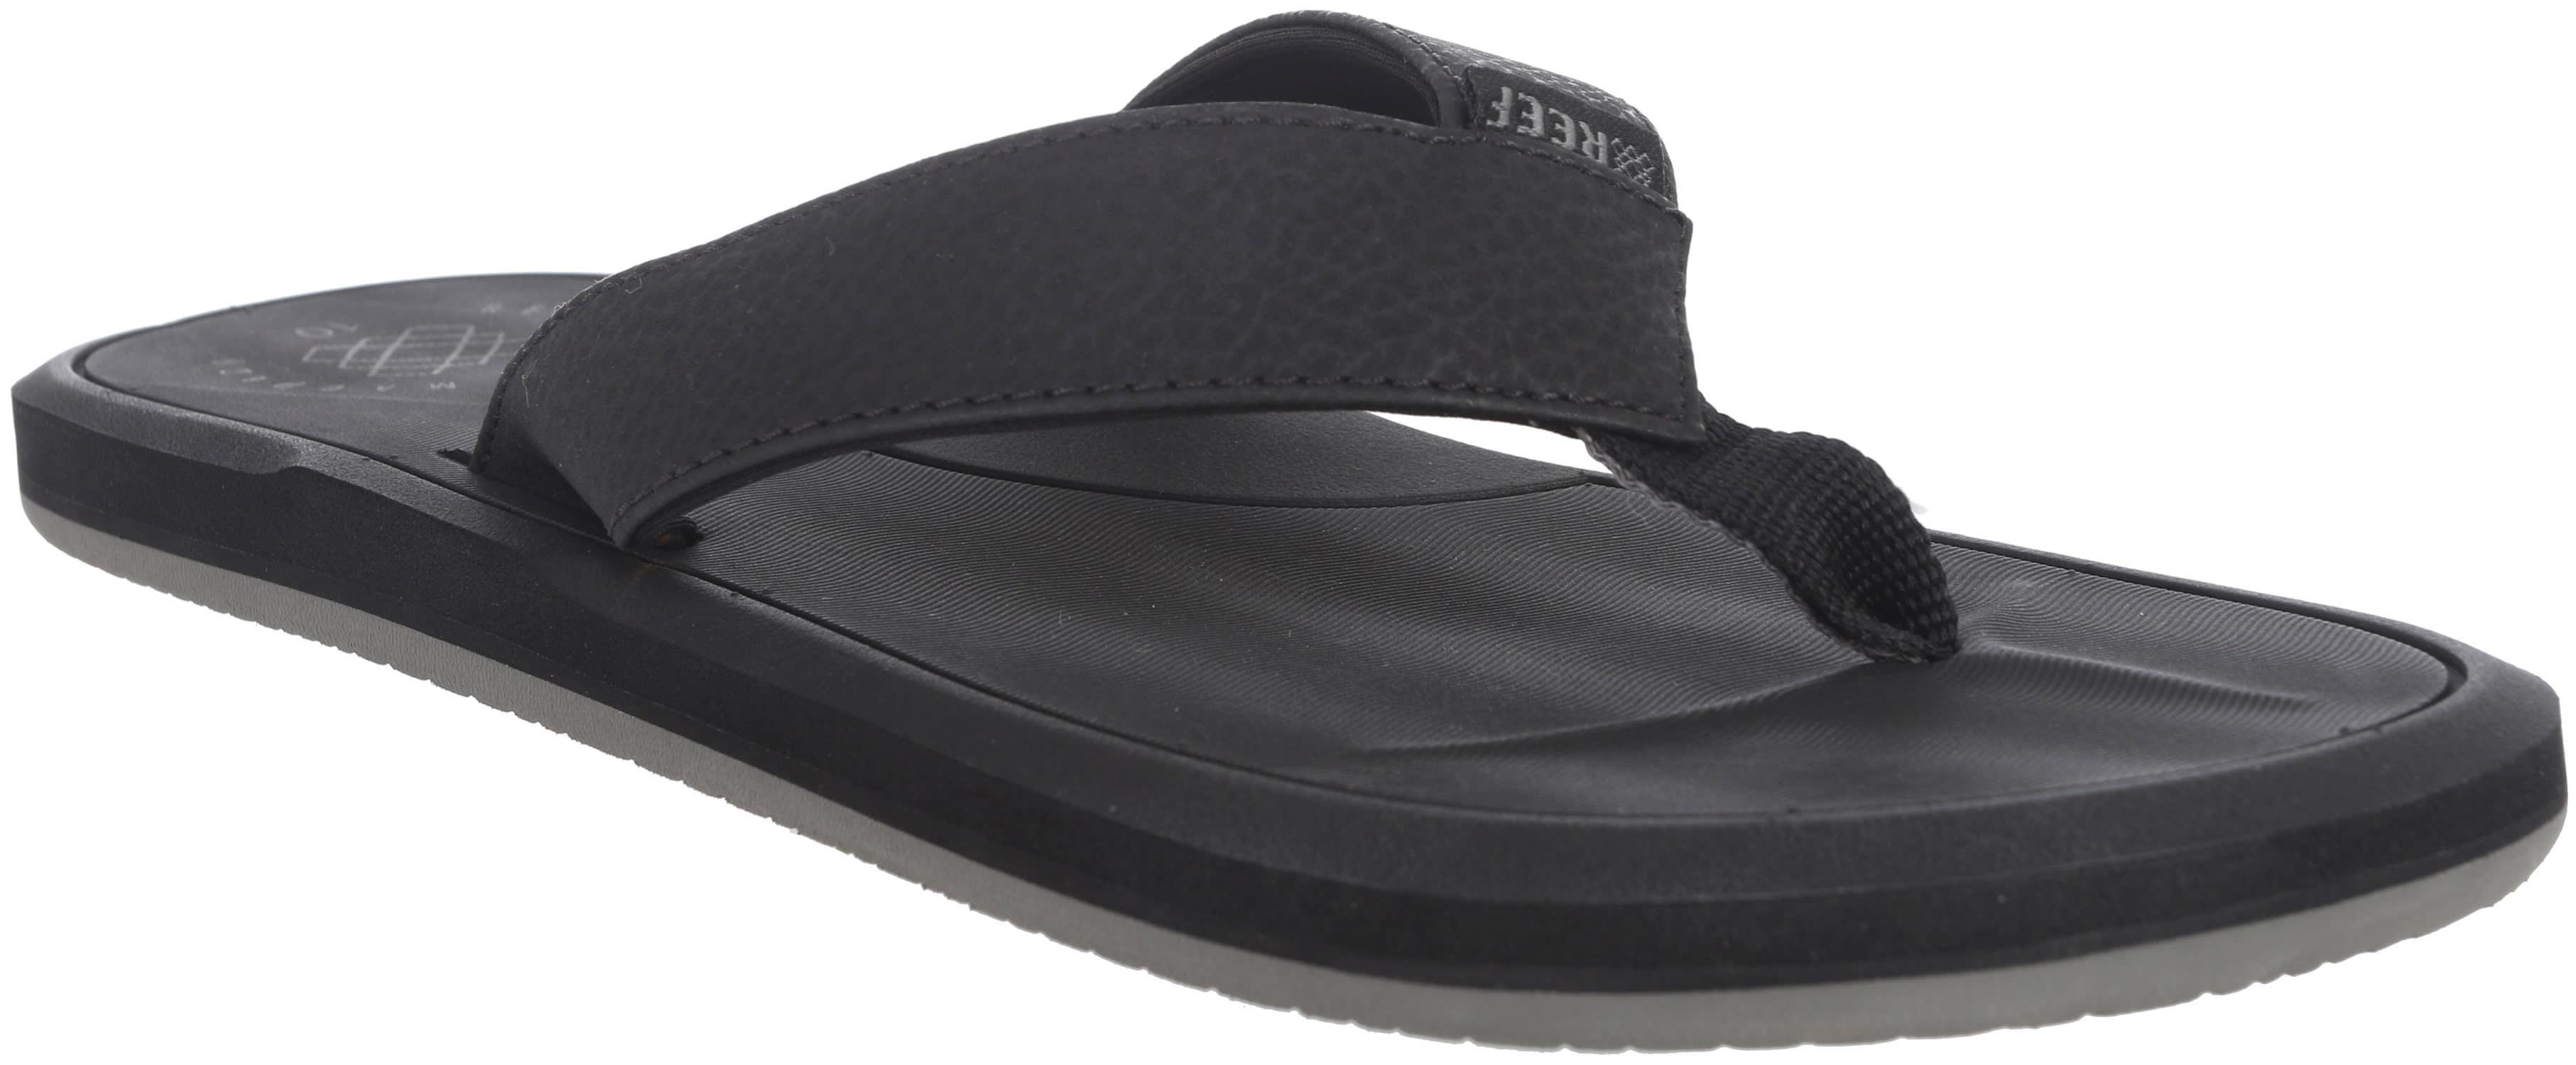 201ce6f6254e Reef Machado Day Sandals